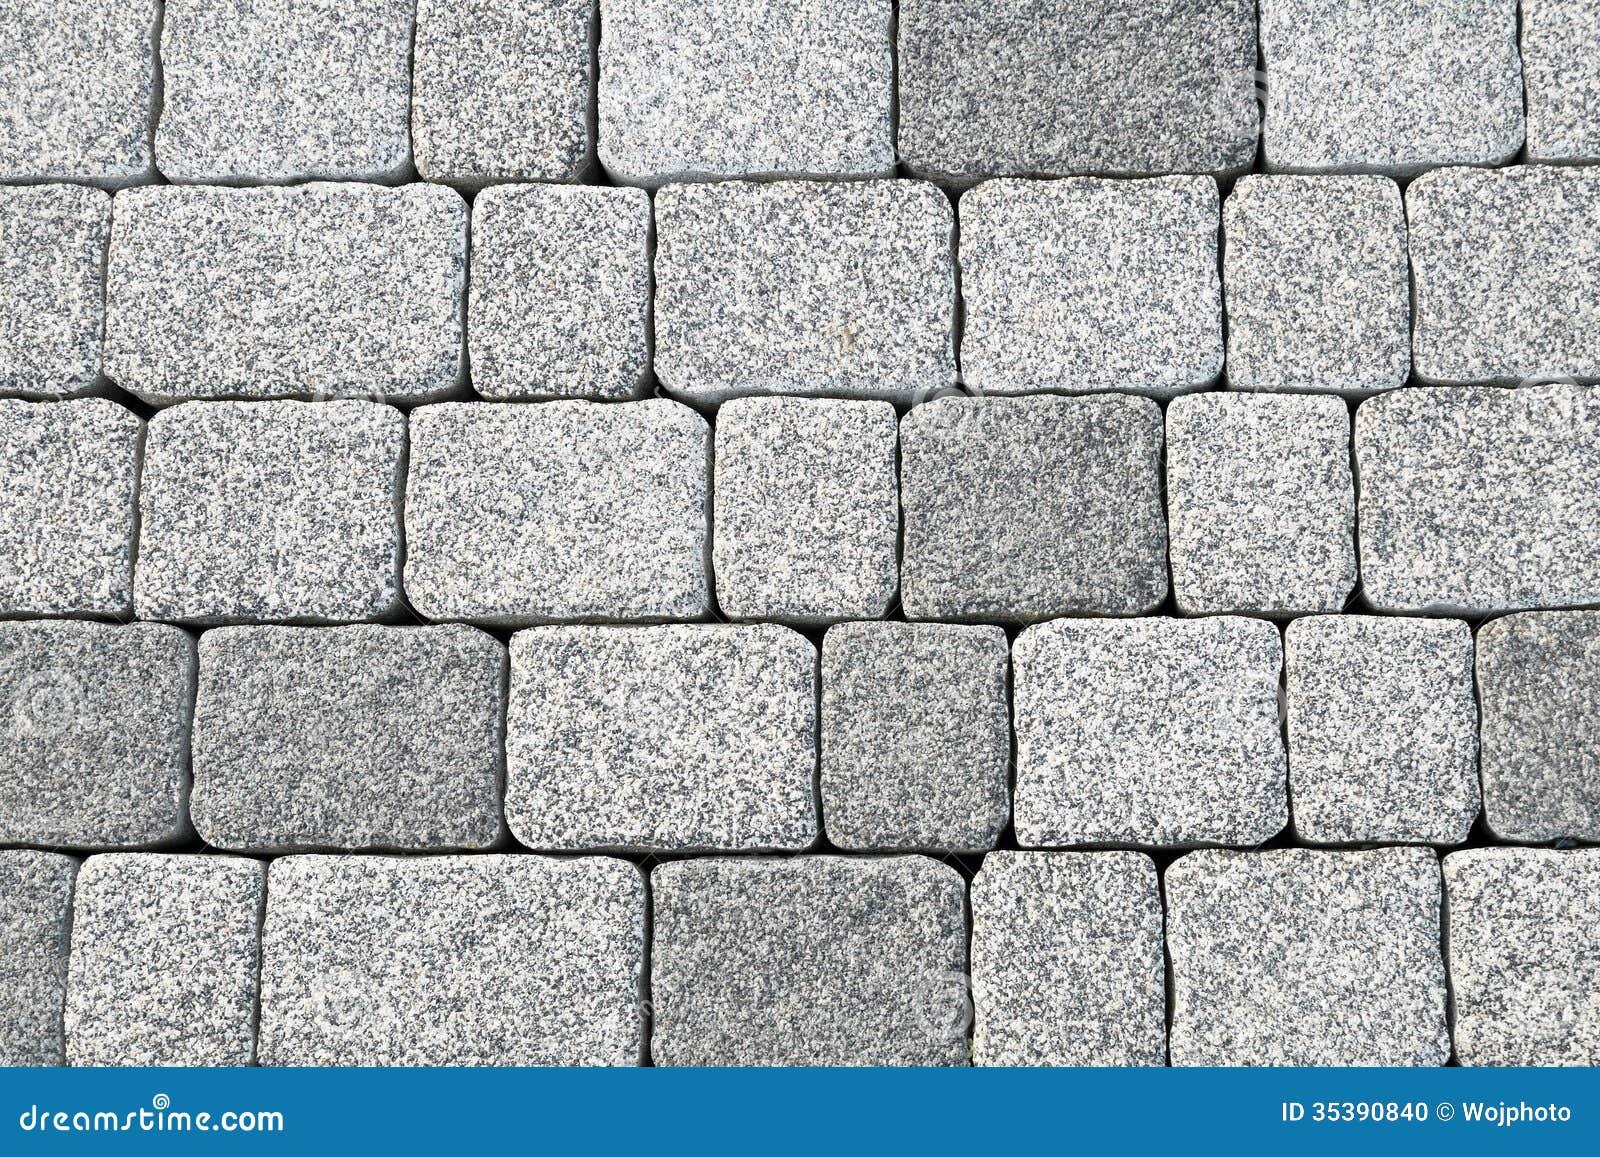 Cobblestone Background Abstract cobblestone pavement